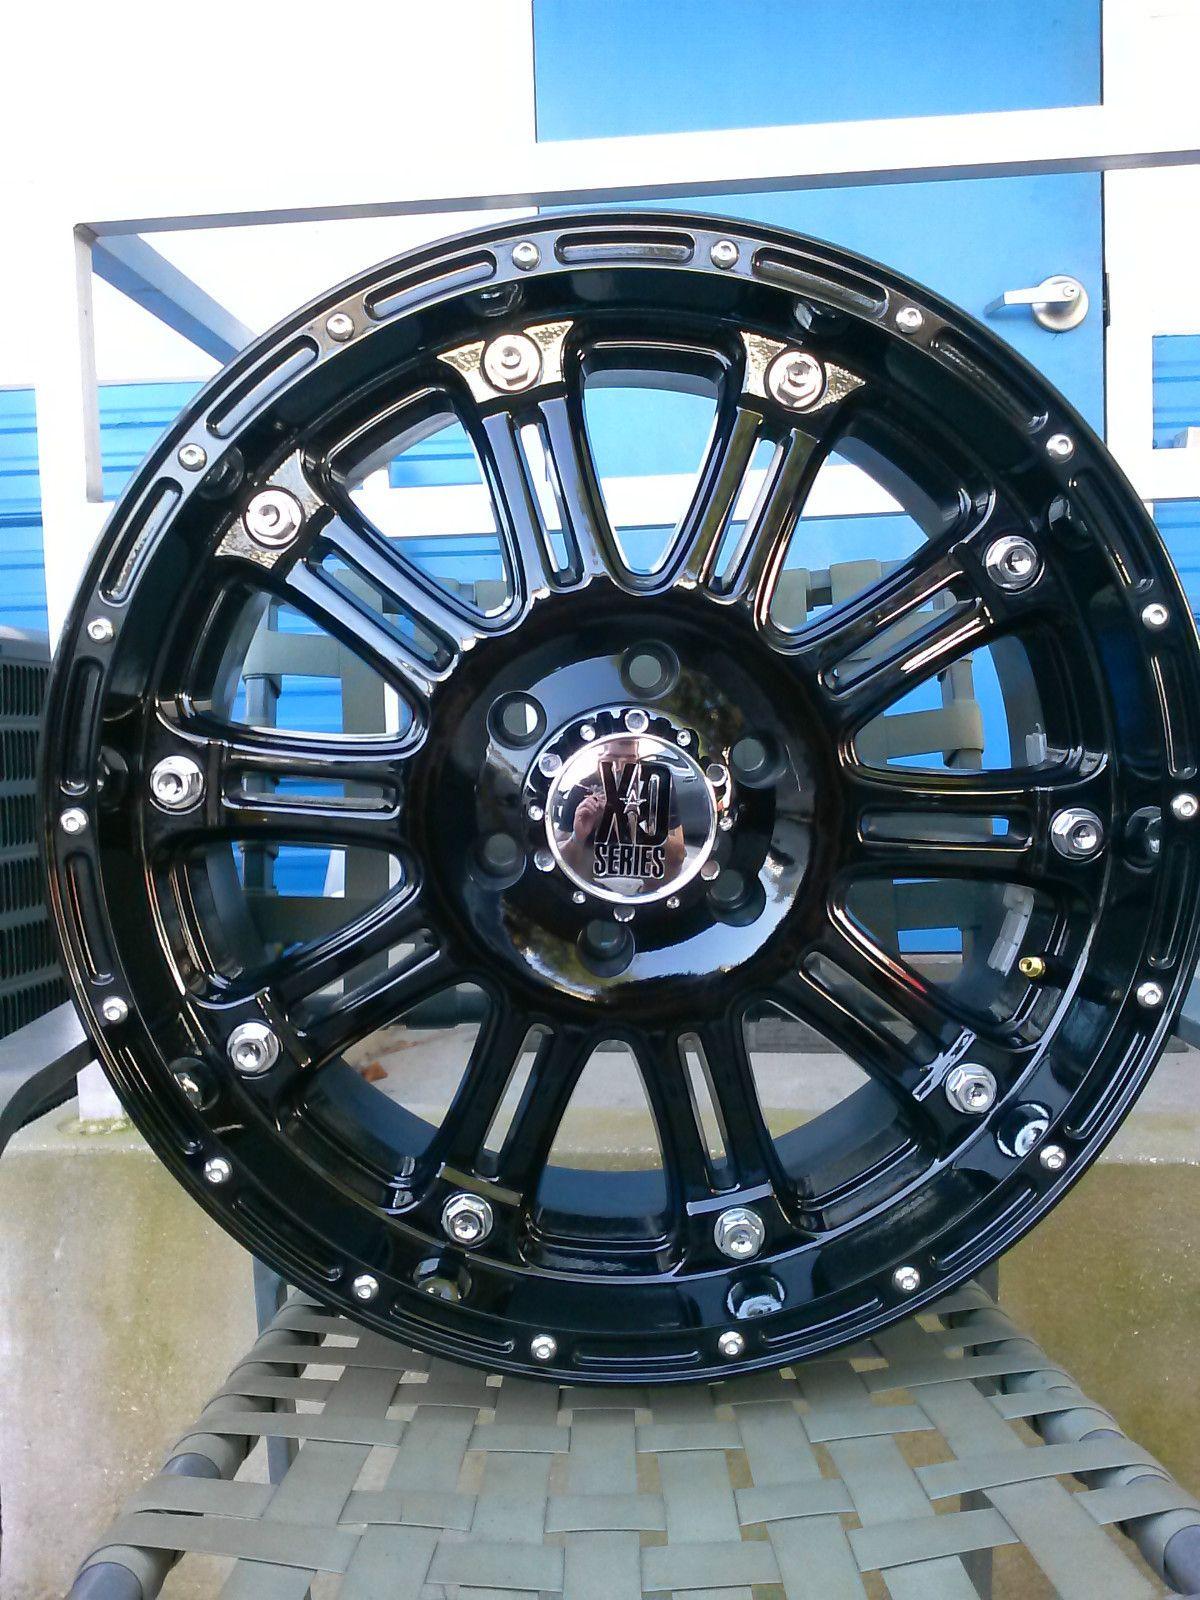 Kmc Wheels Used 20 Inch Black Rims Xd Hoss Explore Classy